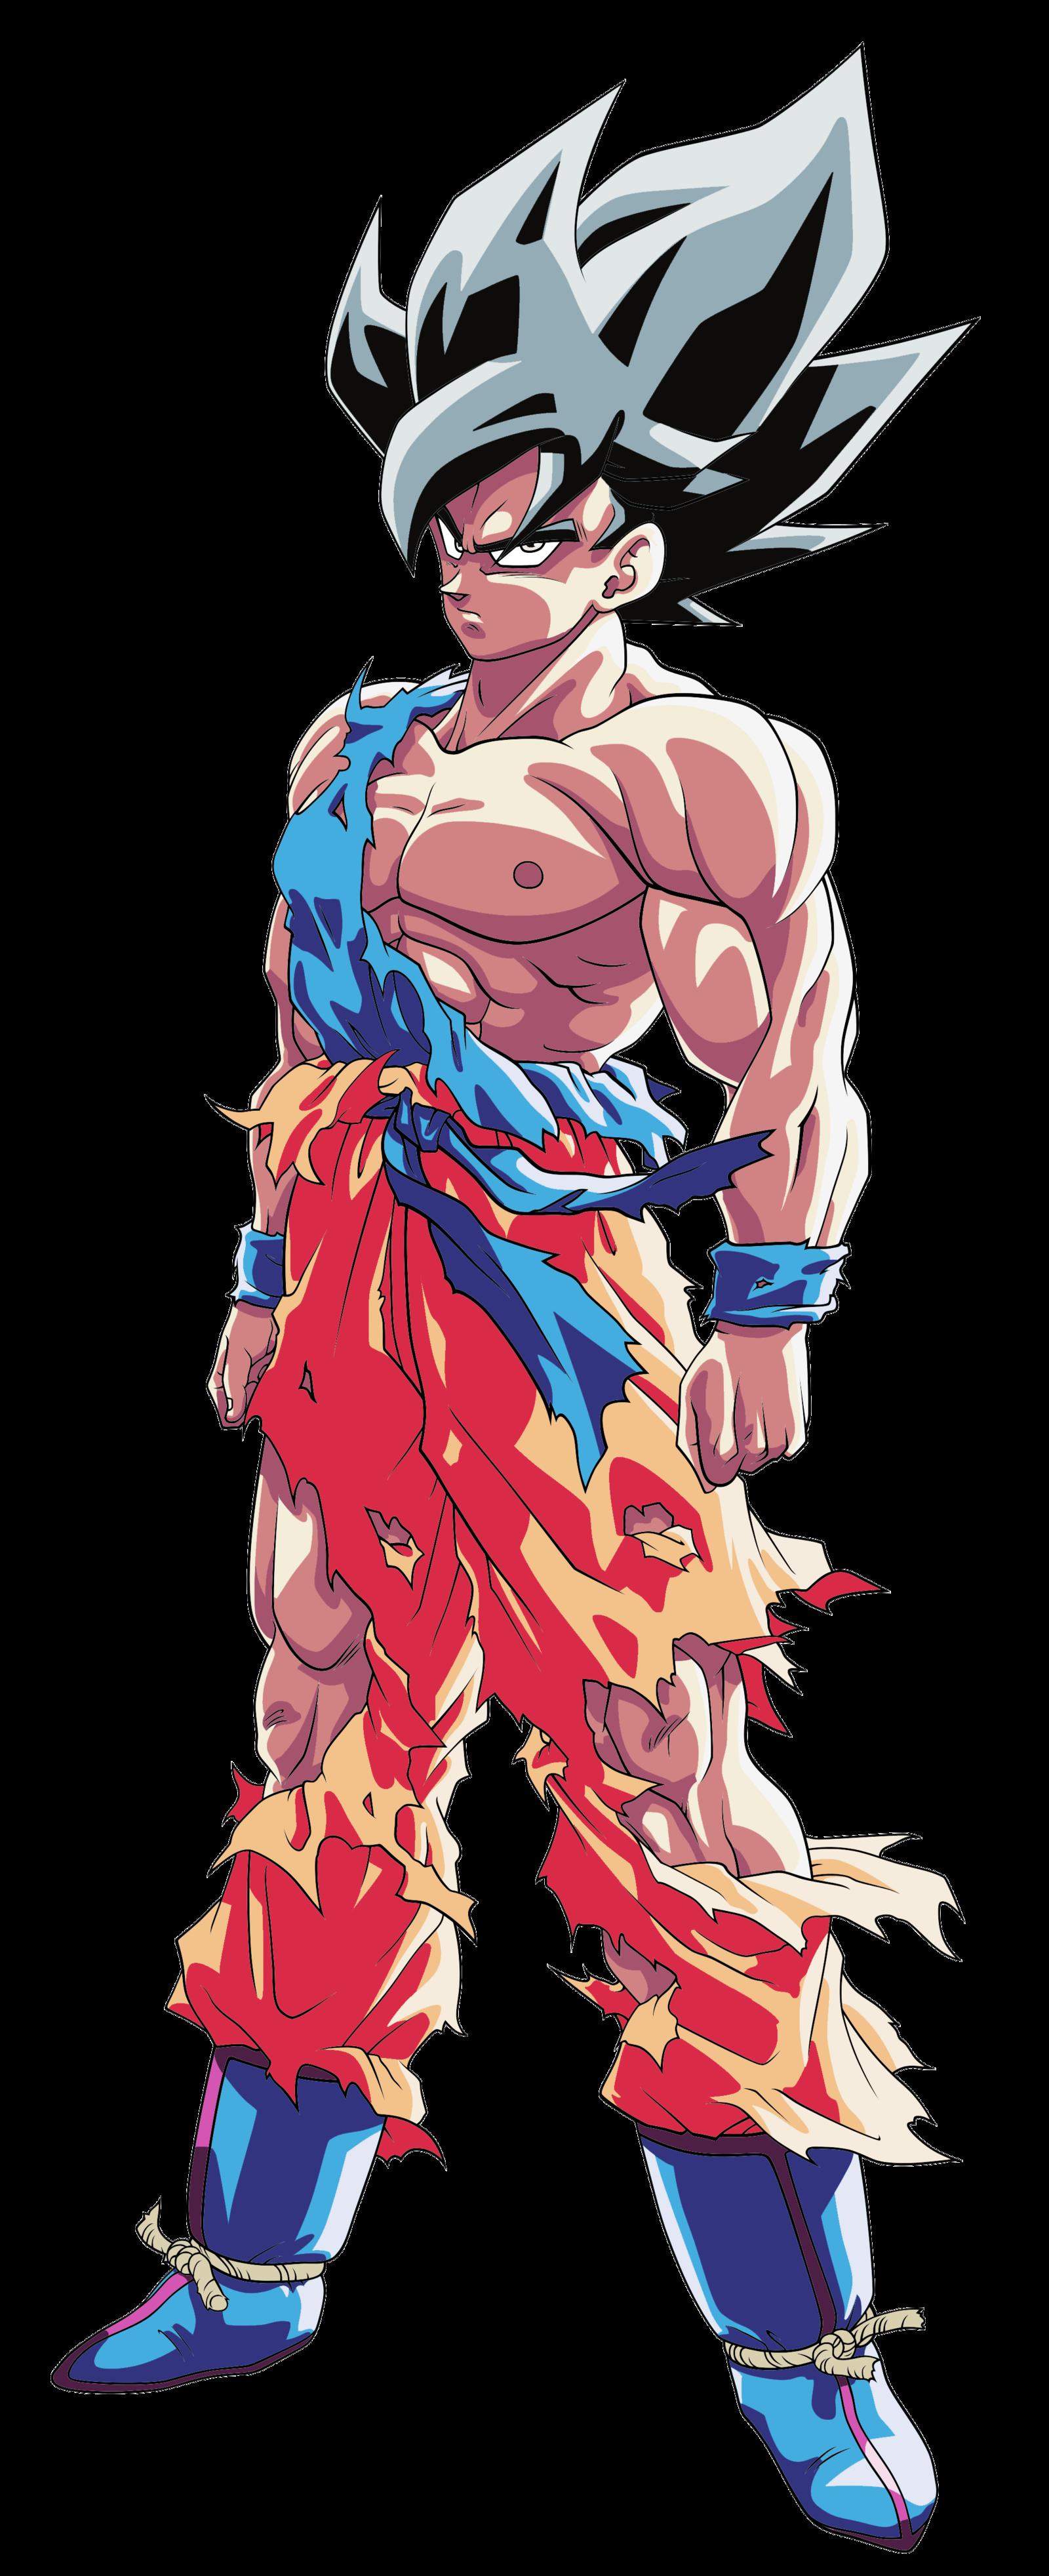 90+ Goku Ultra Instinct Mastered Wallpapers on WallpaperSafari